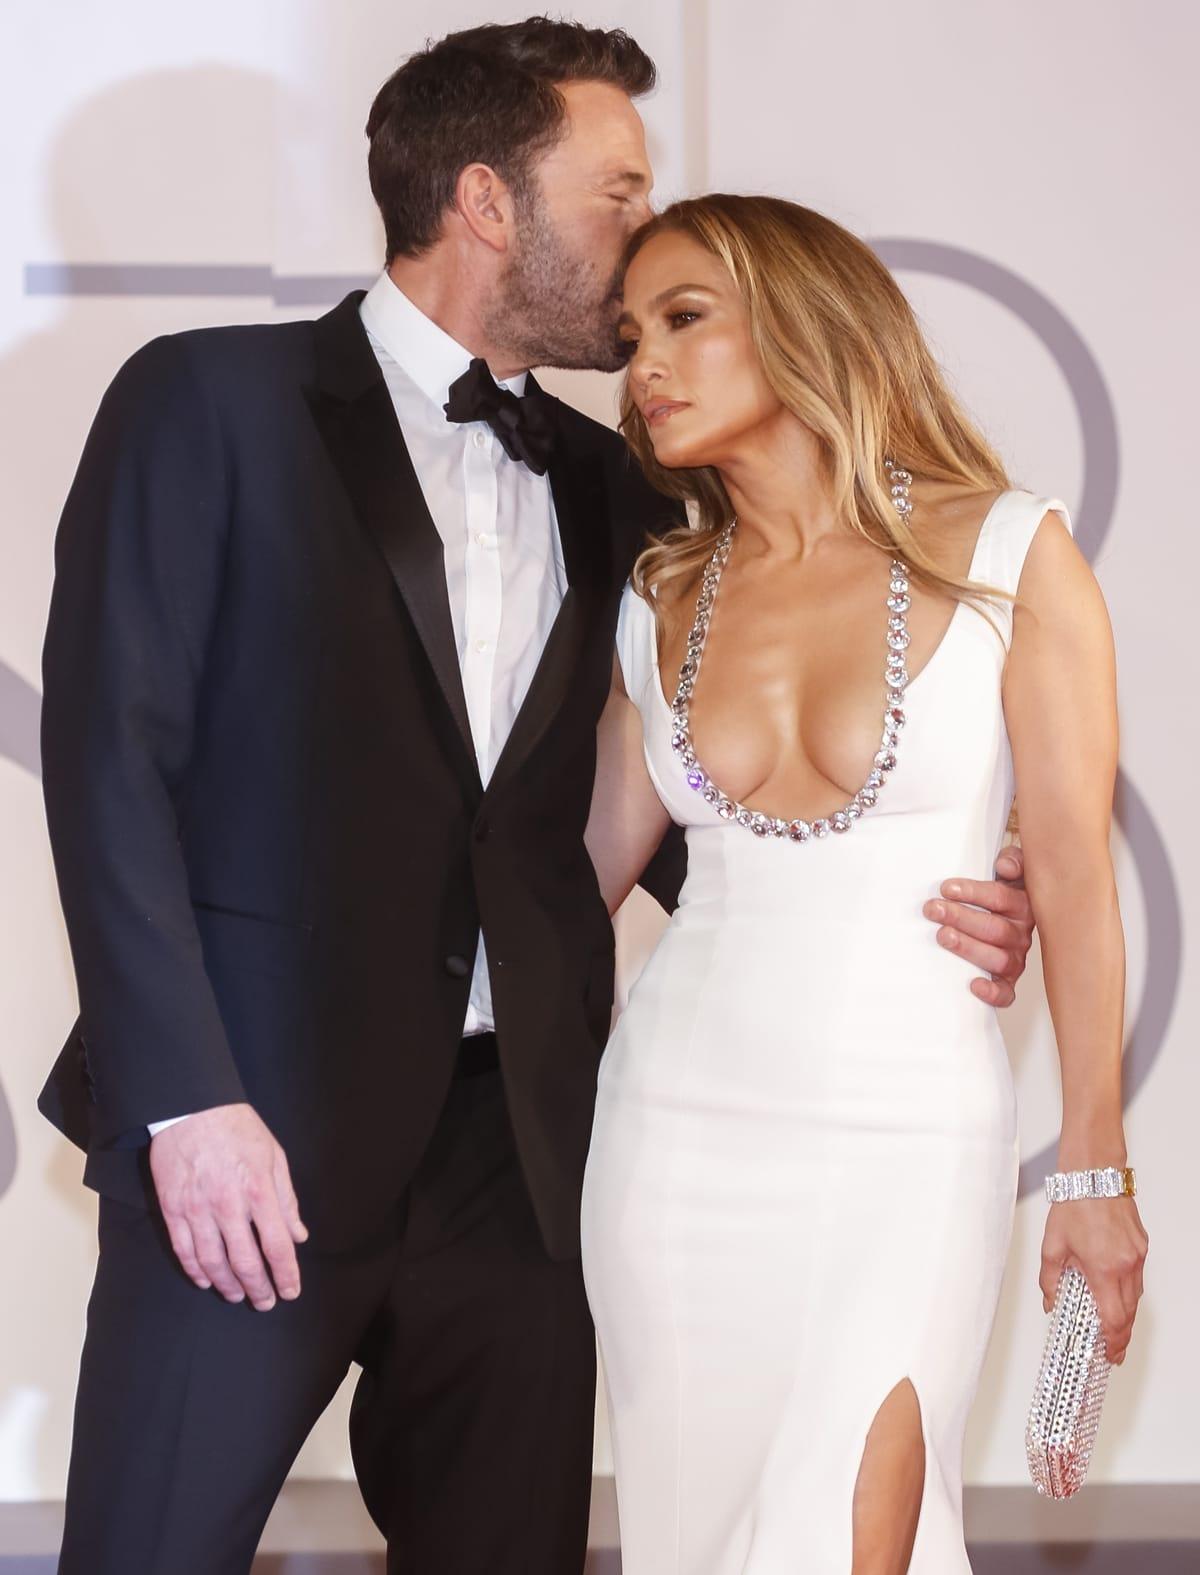 Toting a crystal Judith Leiber clutch, Jennifer Lopez gets a kiss from Ben Affleck